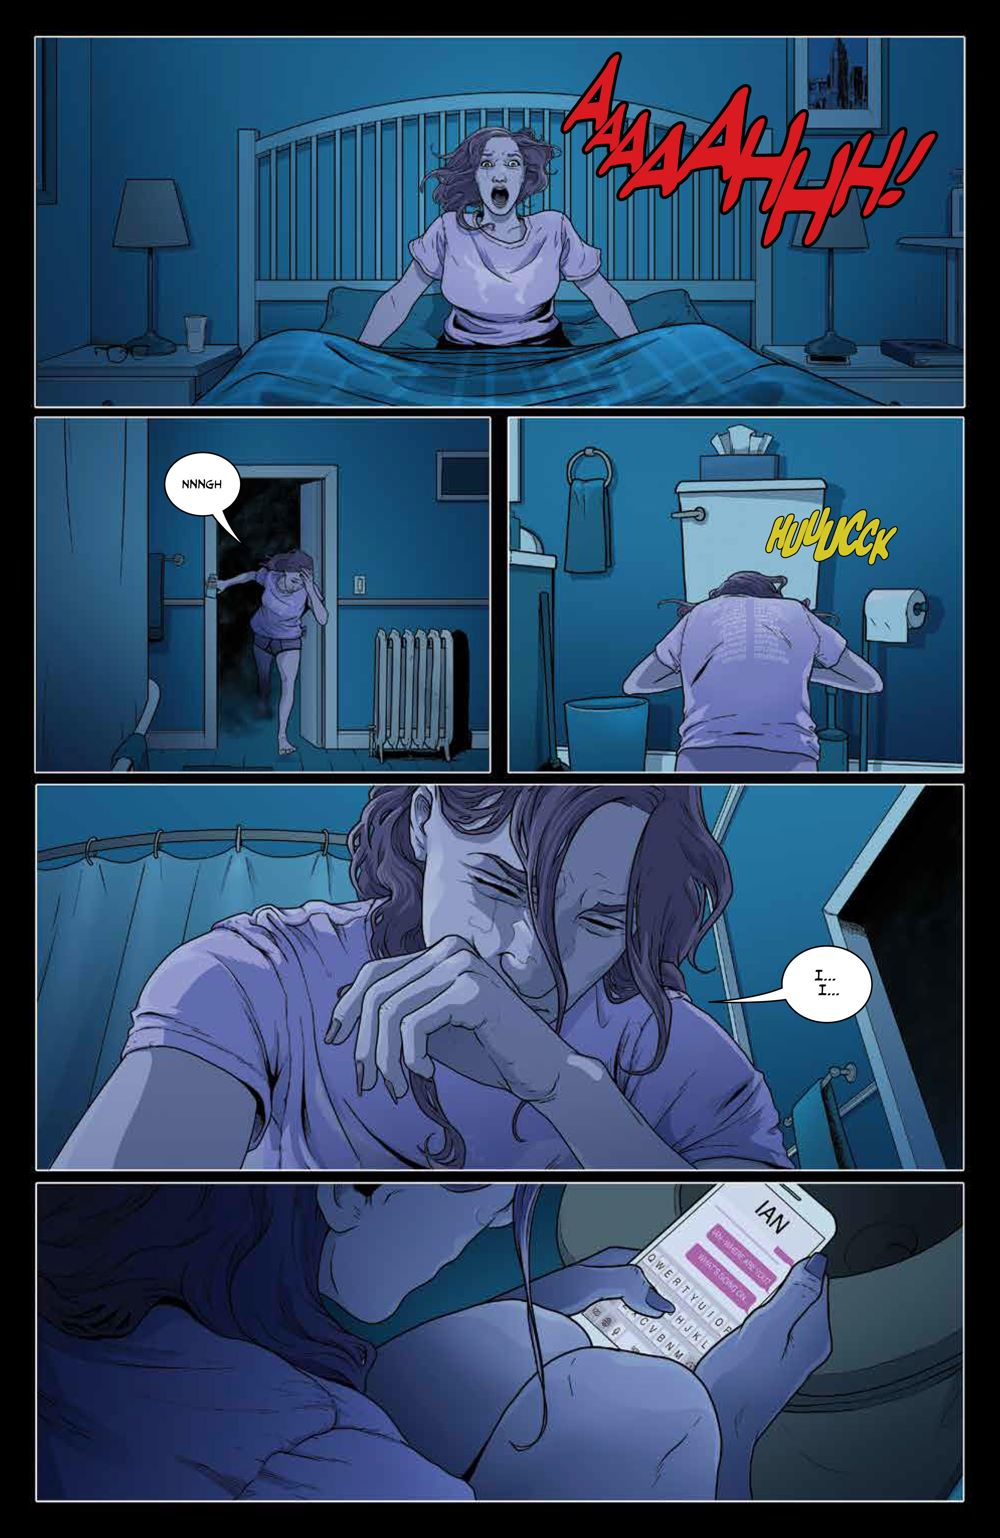 RedMother_v3_SC_PRESS_22 ComicList Previews: RED MOTHER VOLUME 3 TP